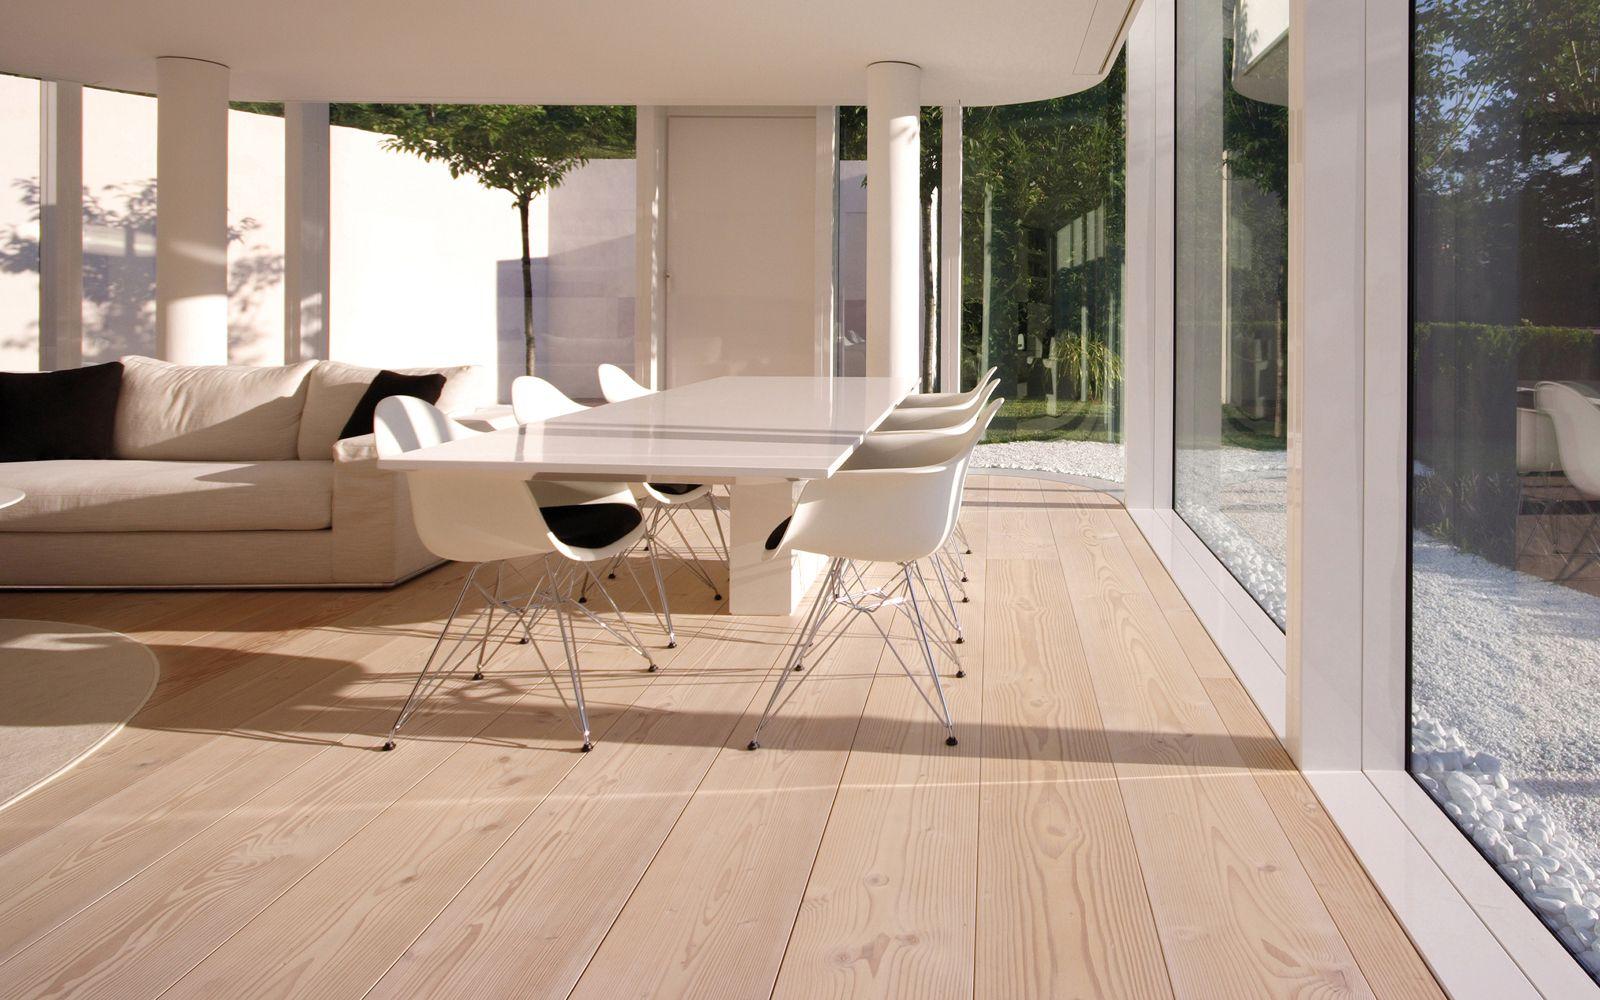 Madera para suelo radiante perfect with madera para suelo - Suelo radiante parquet ...